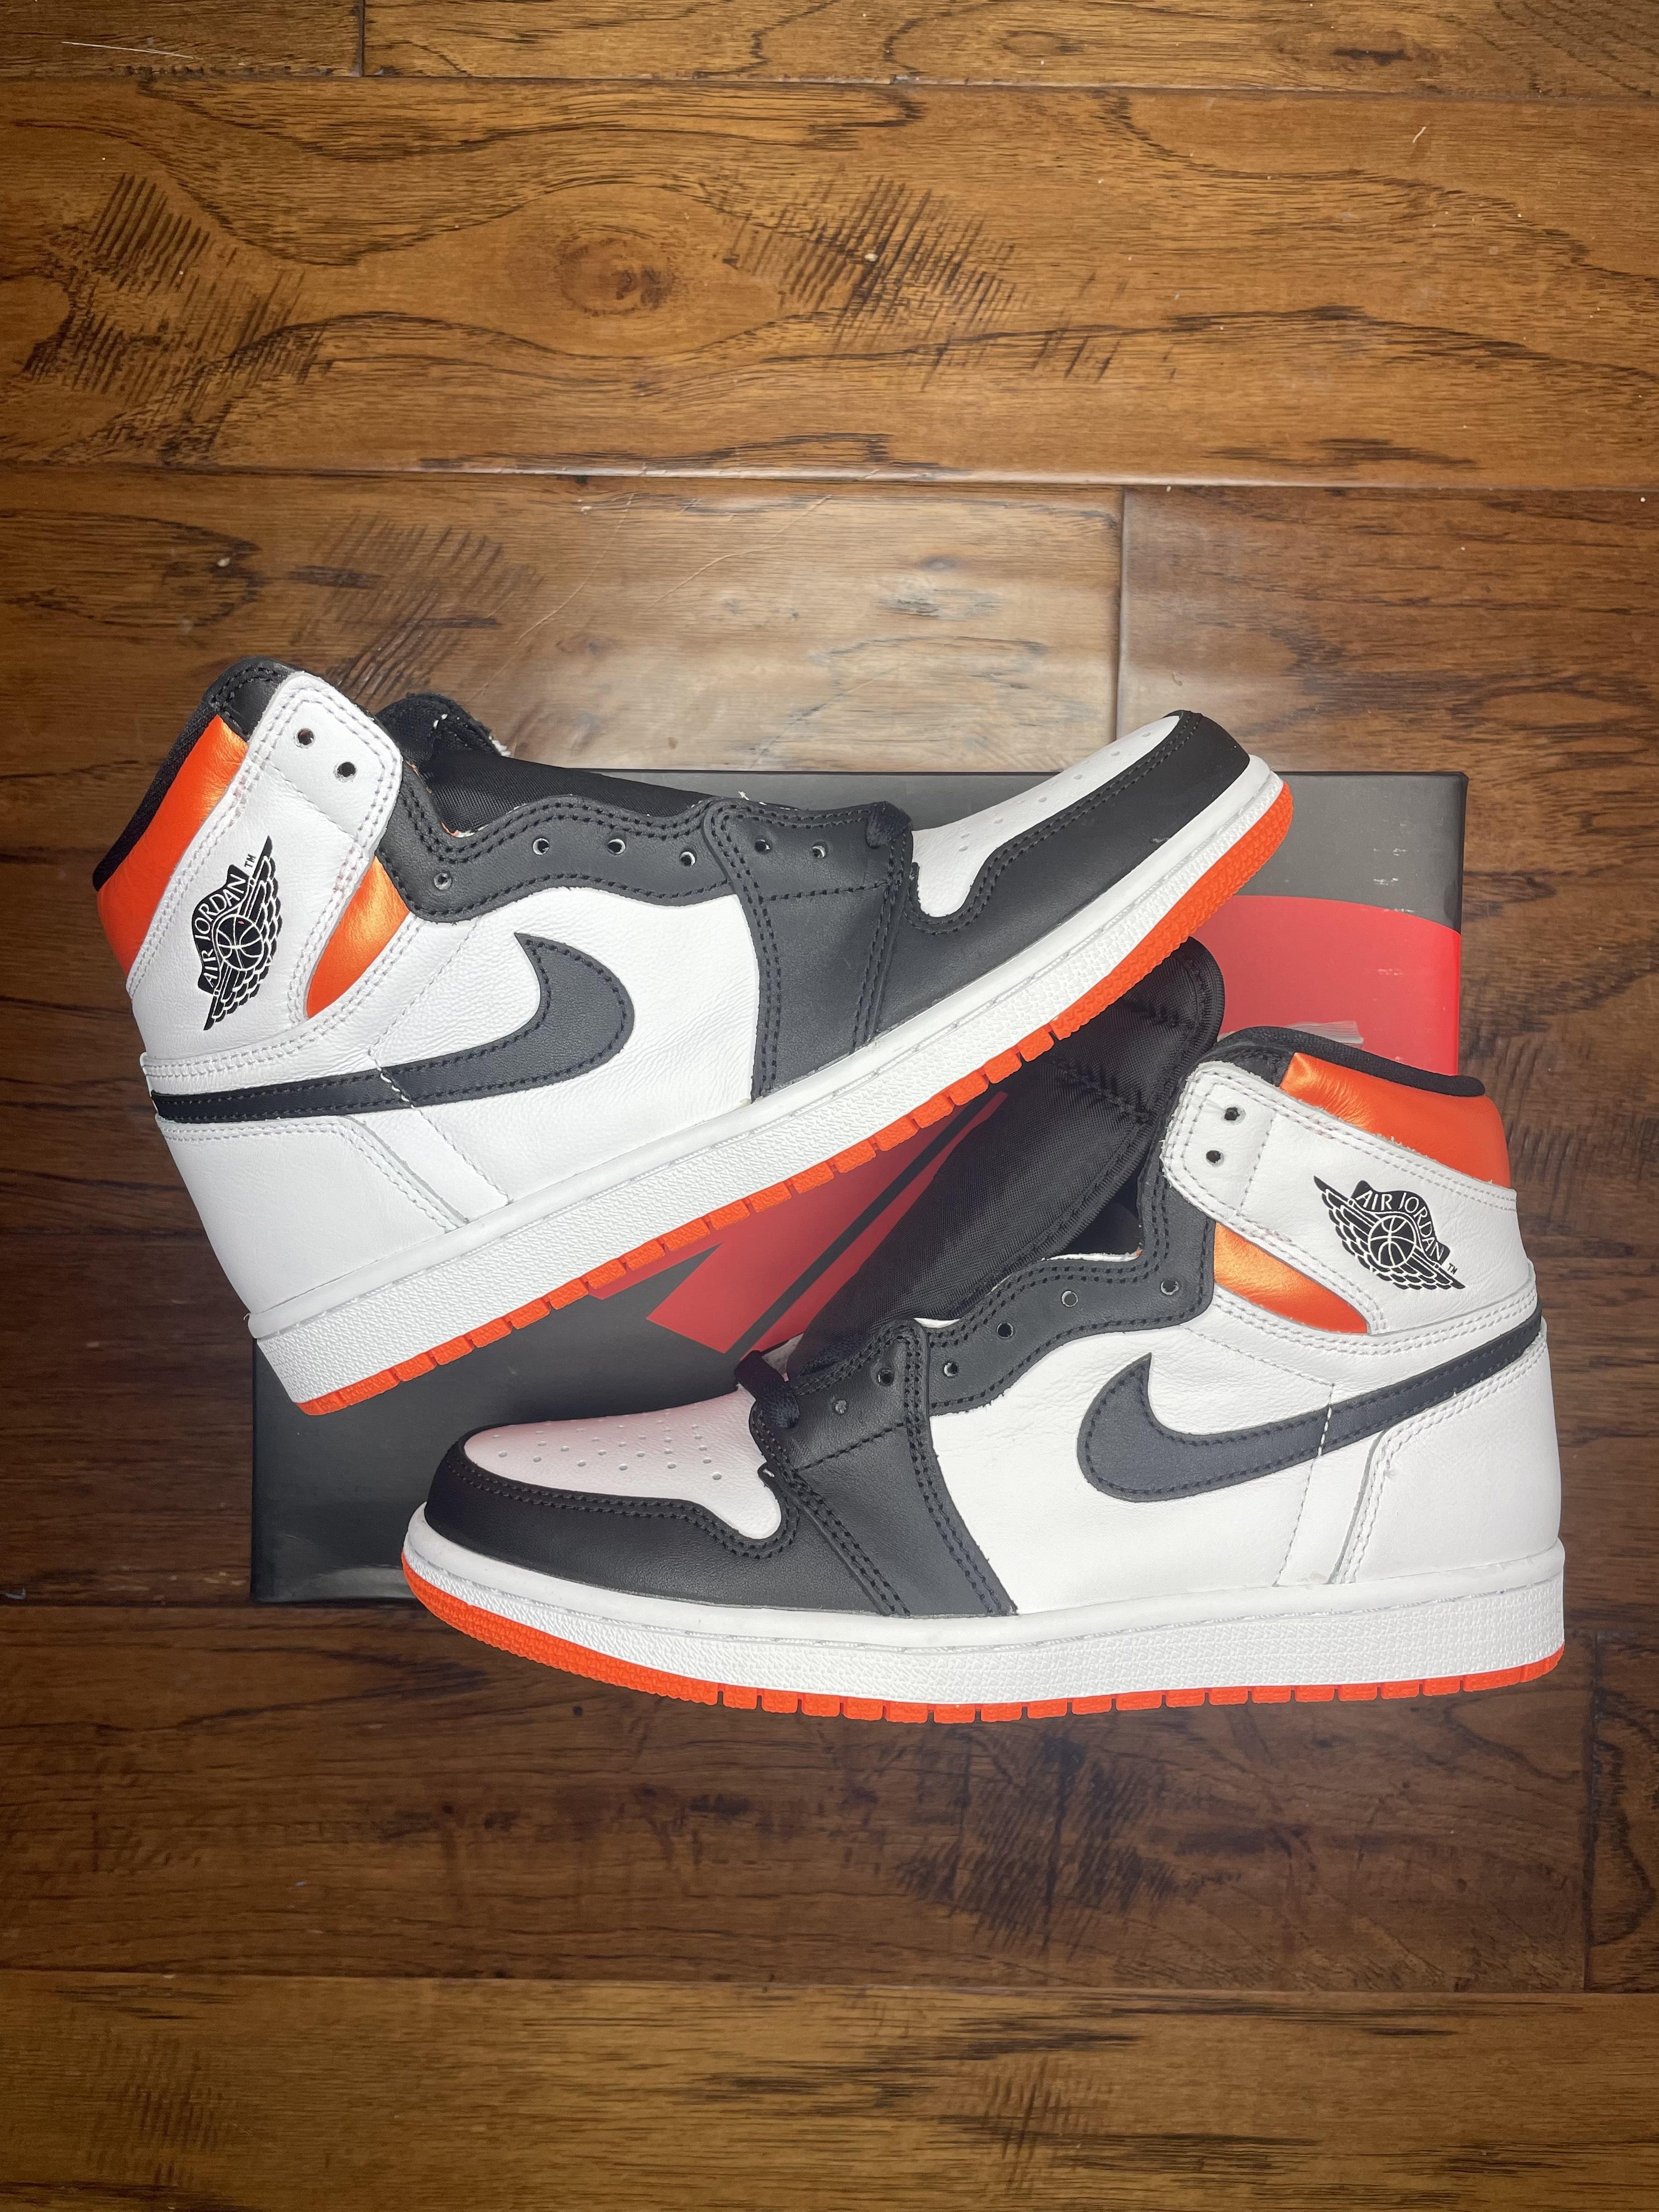 Air Jordan - $220 - Size 8